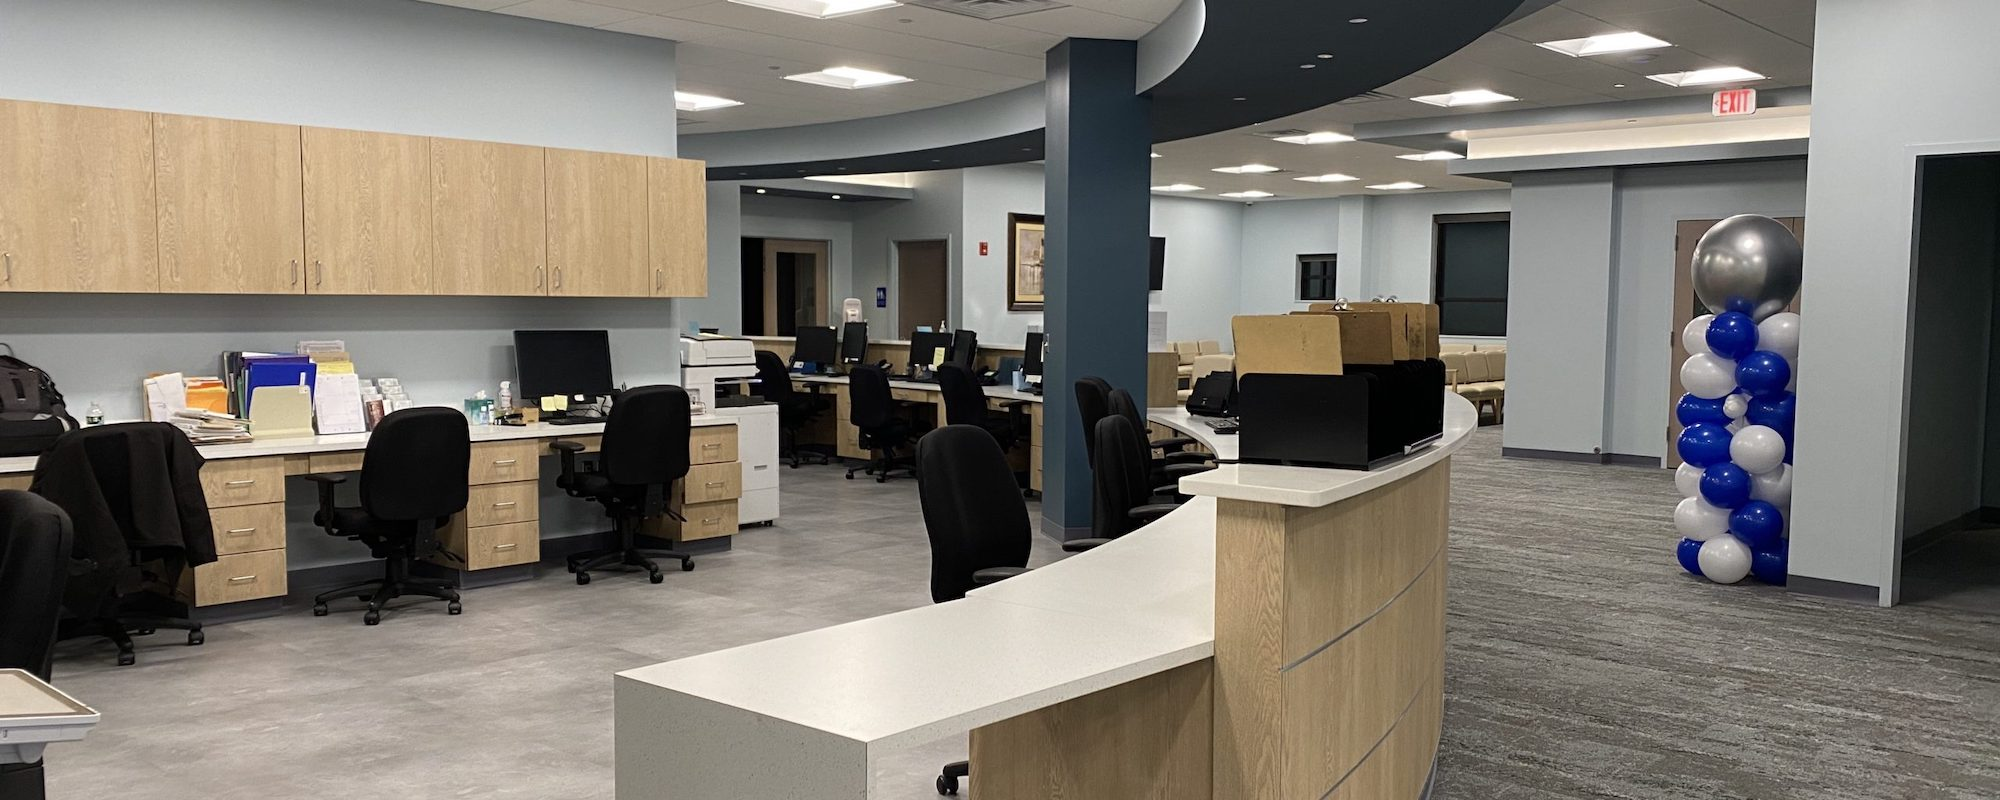 Monroe Twp office at 298 Applegarth Rd is open